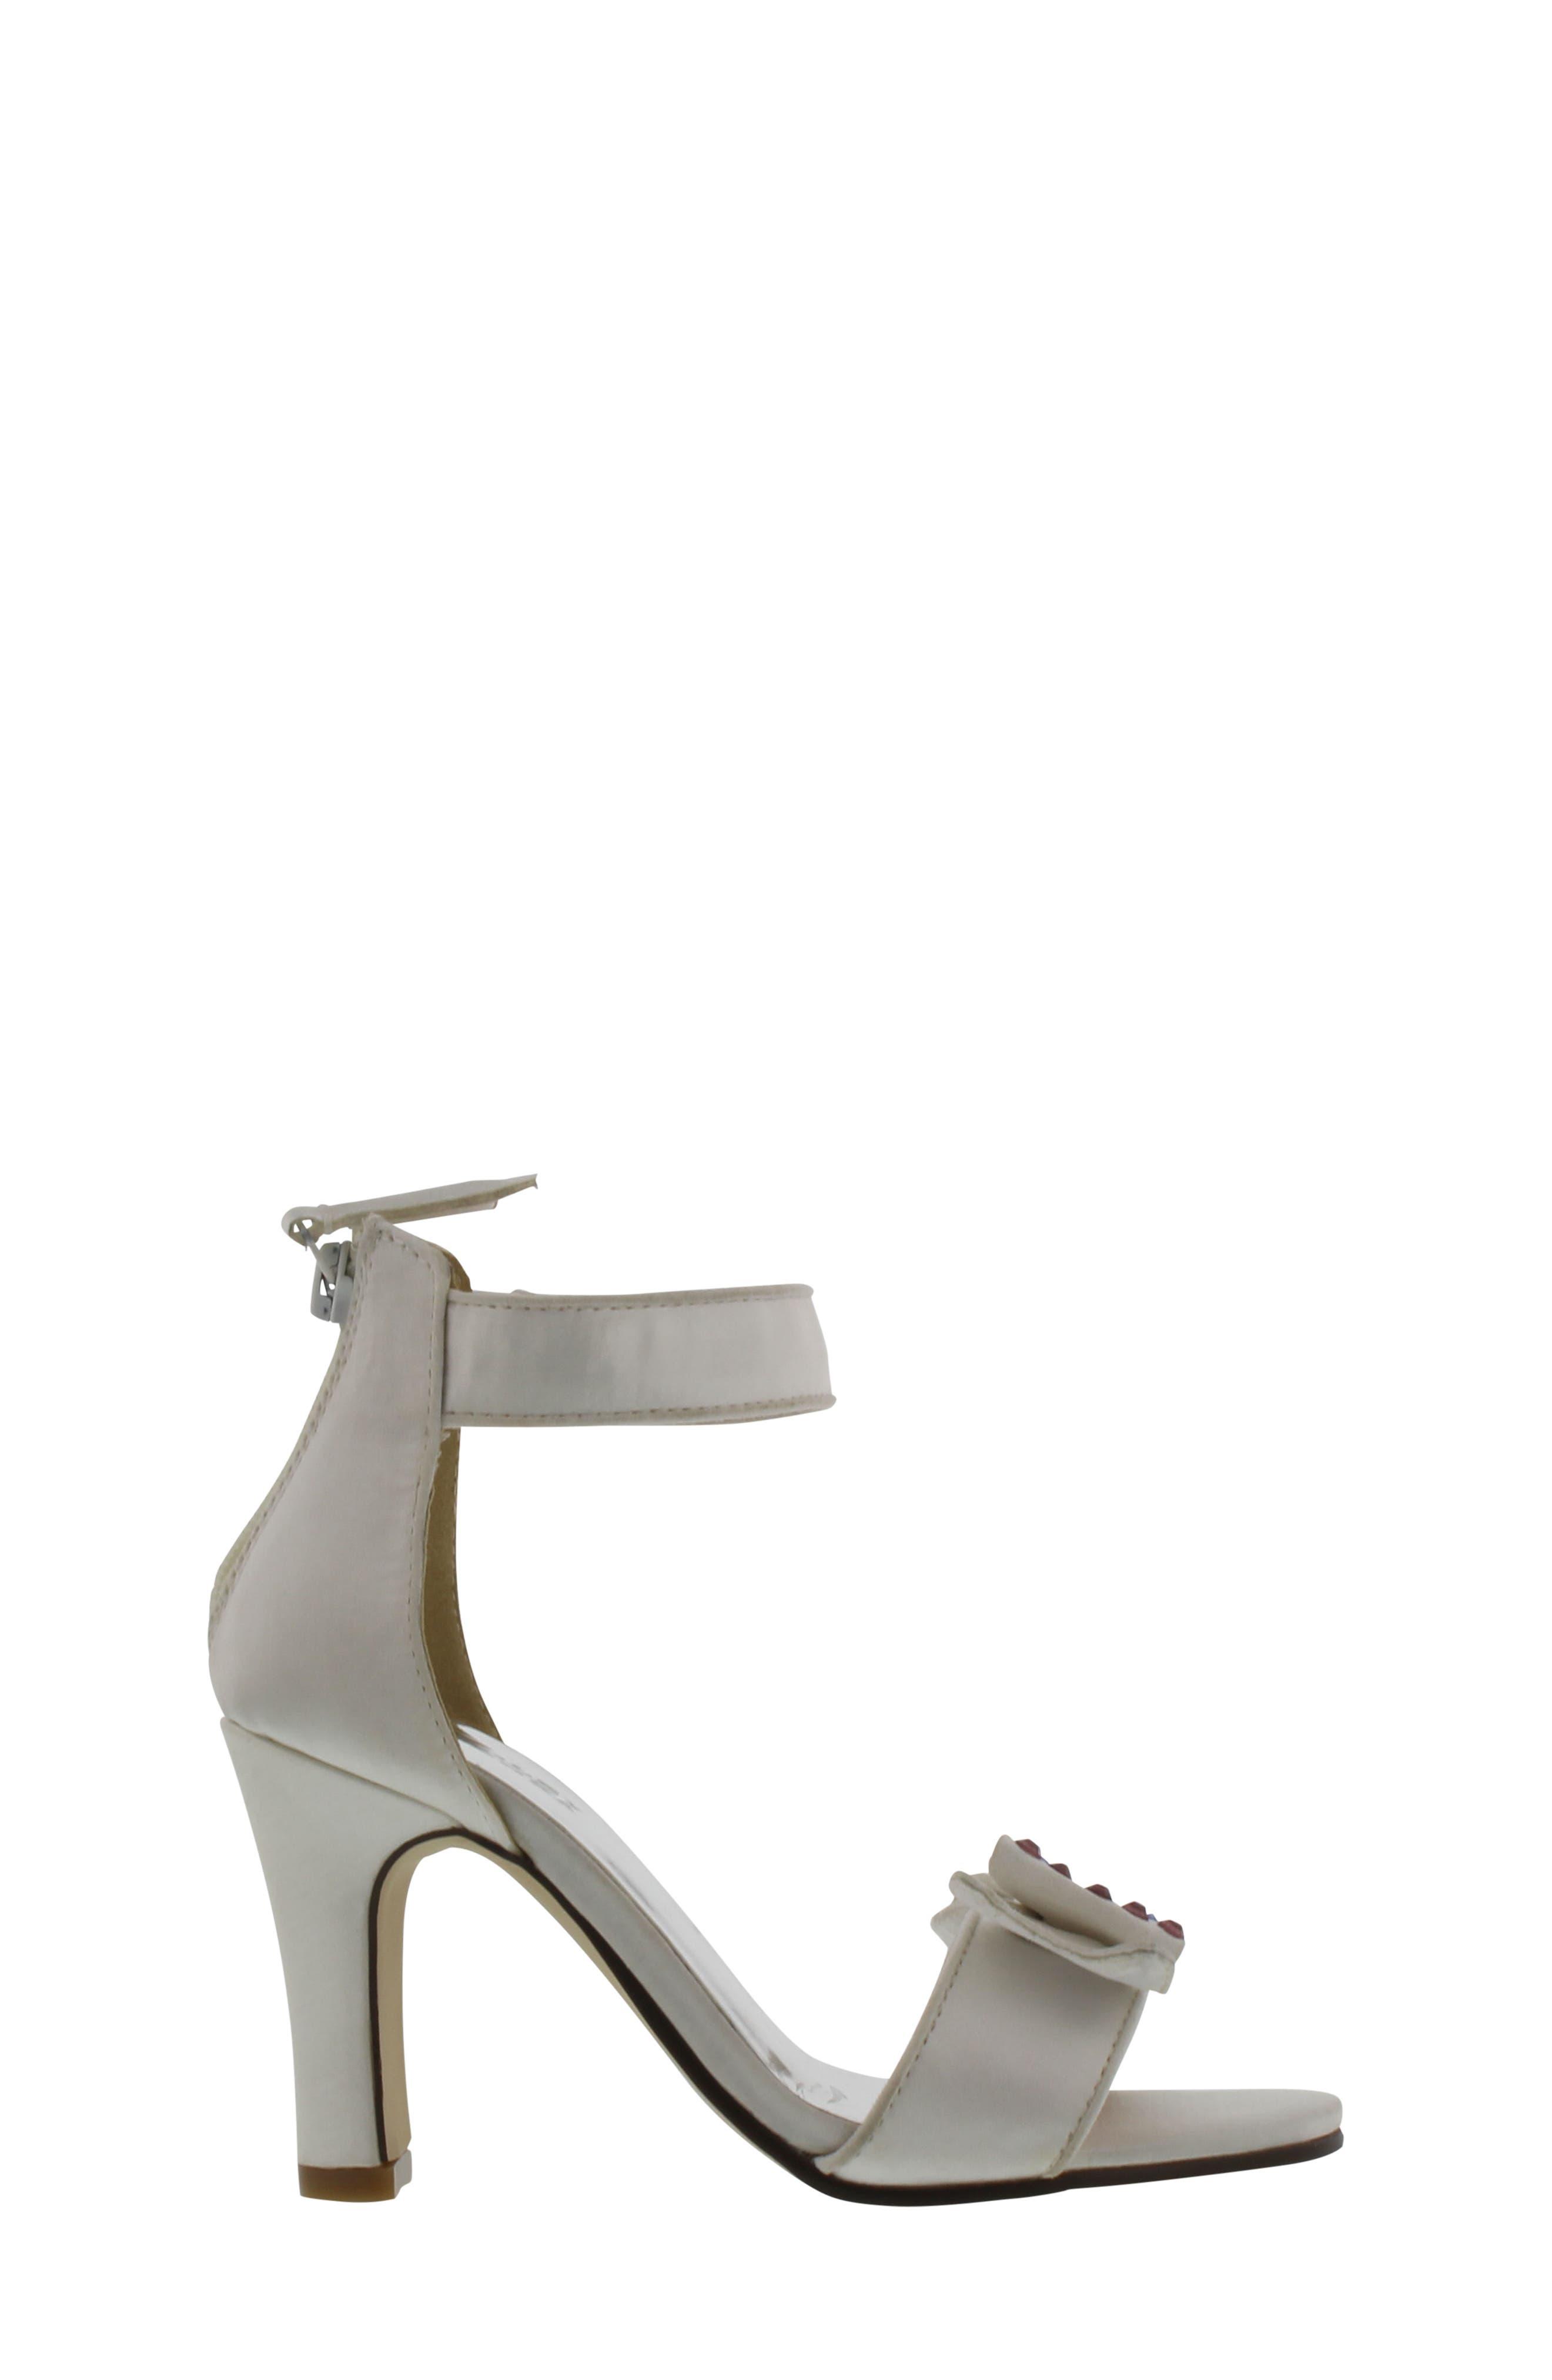 Kendall Embellished Bow Sandal,                             Alternate thumbnail 3, color,                             White Multi